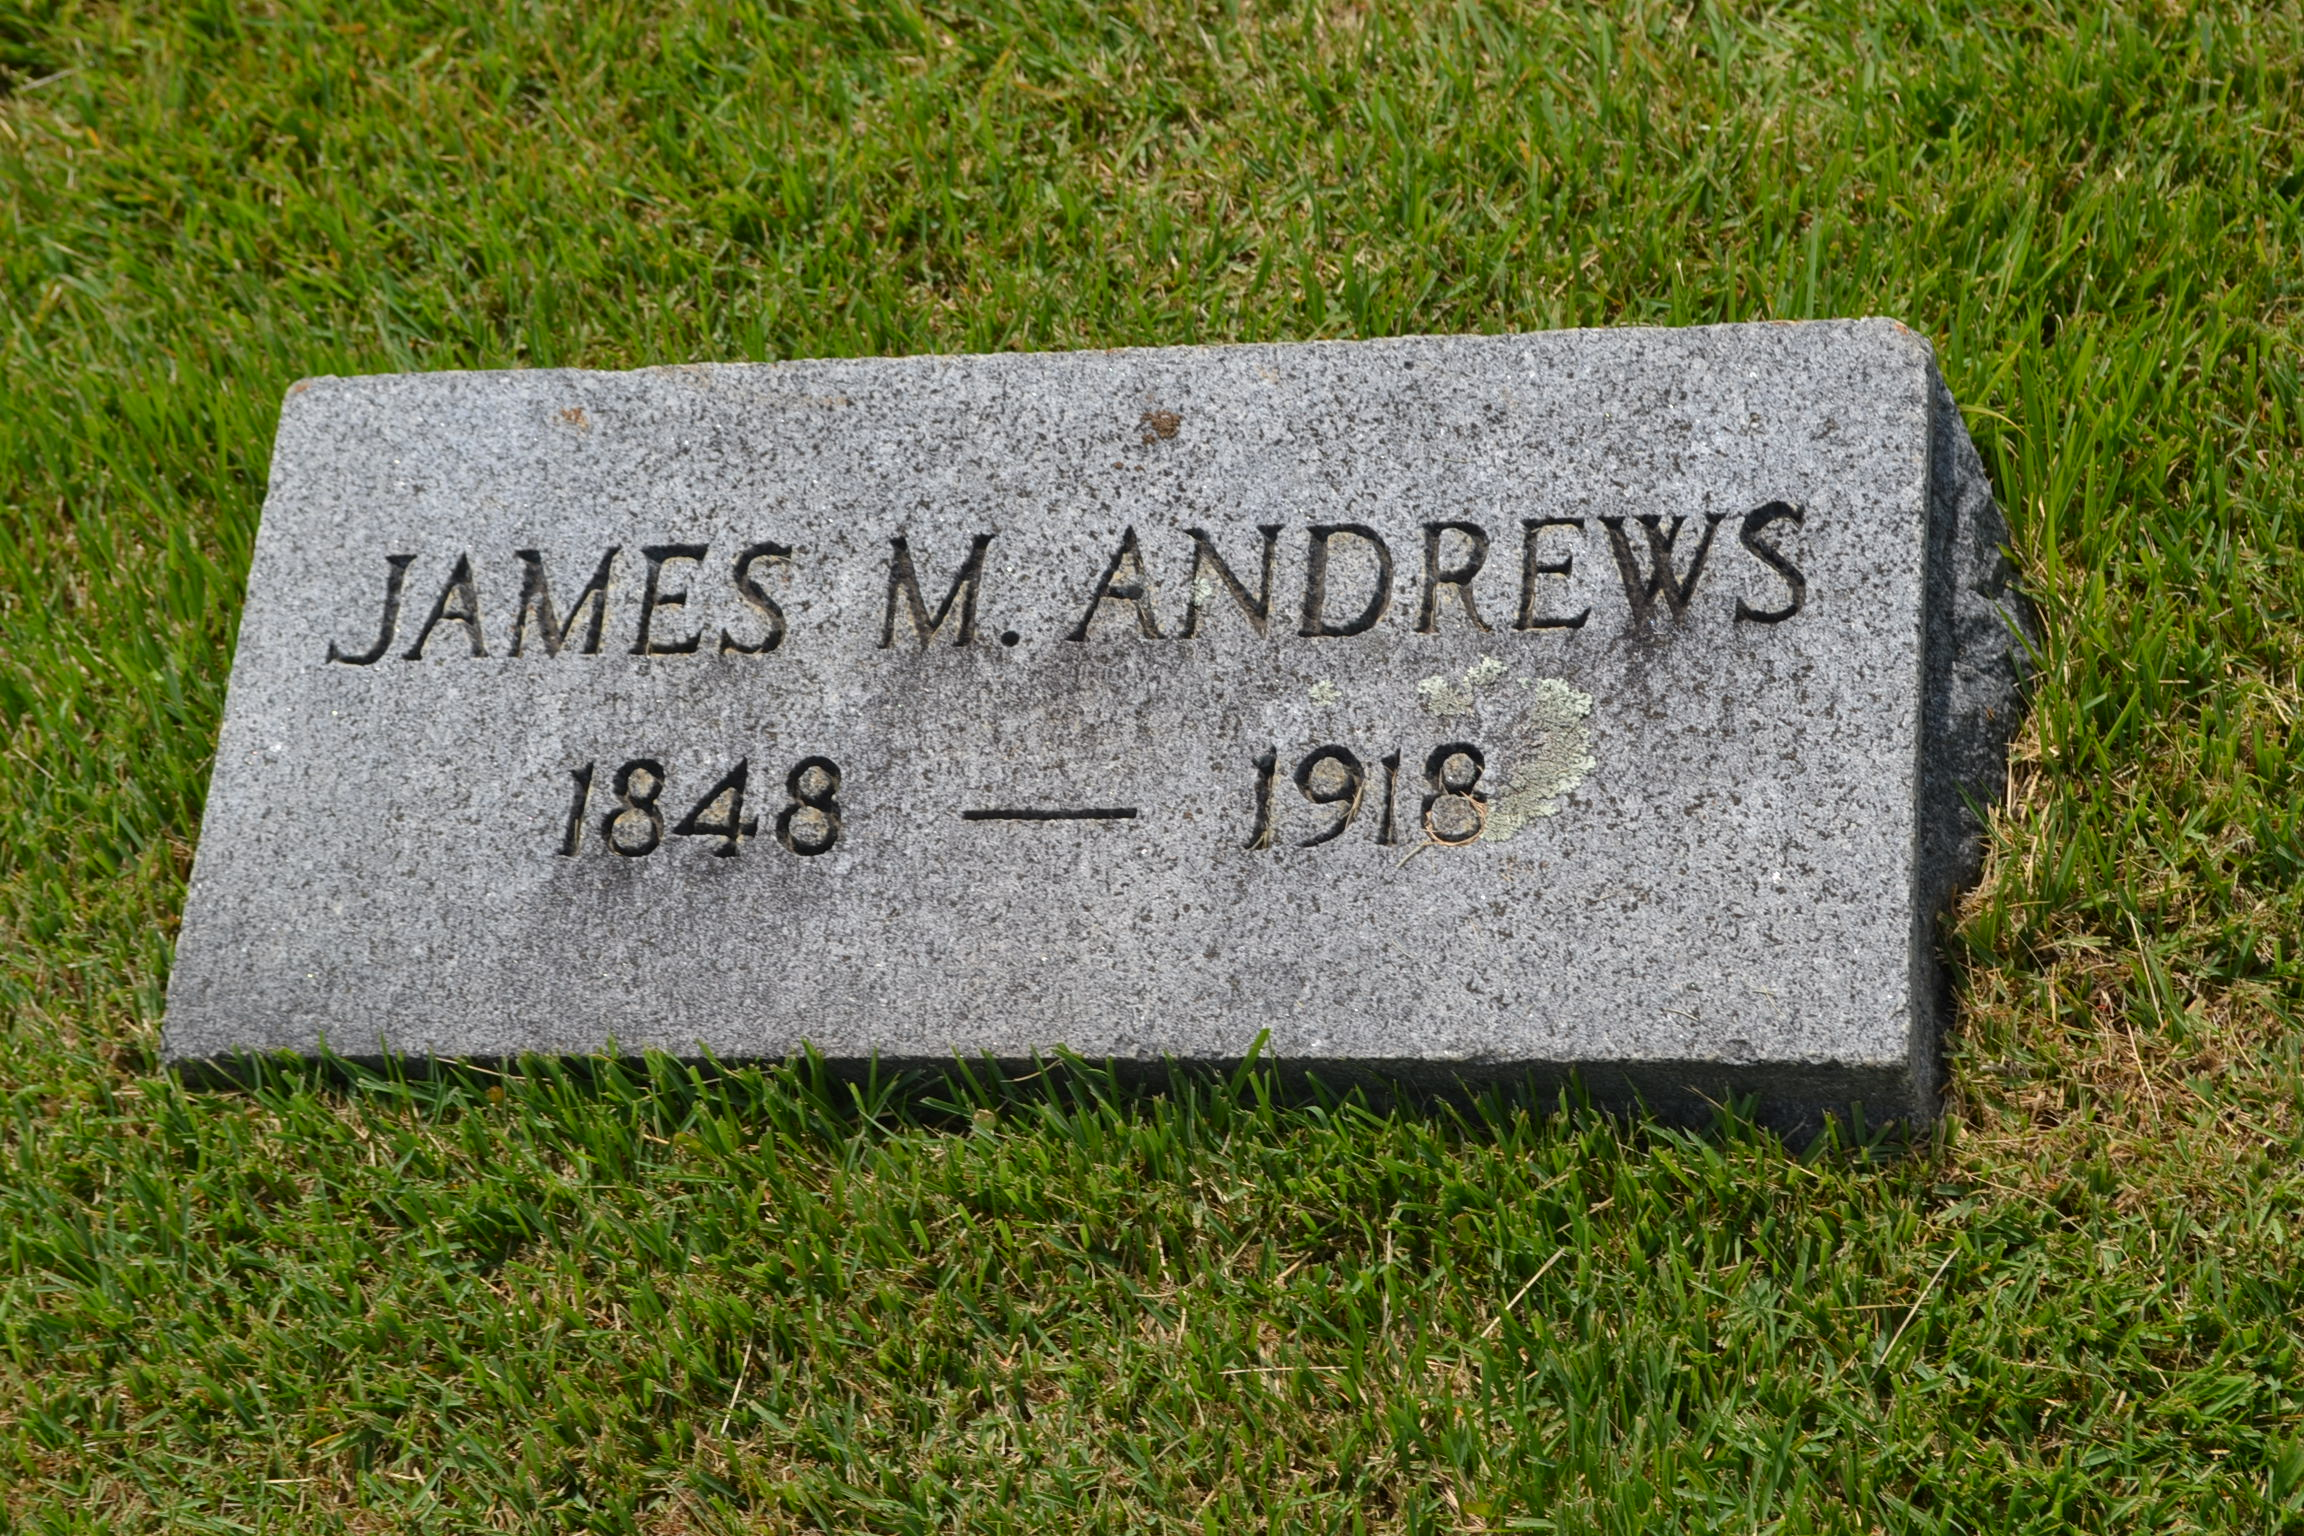 James M. Andrews